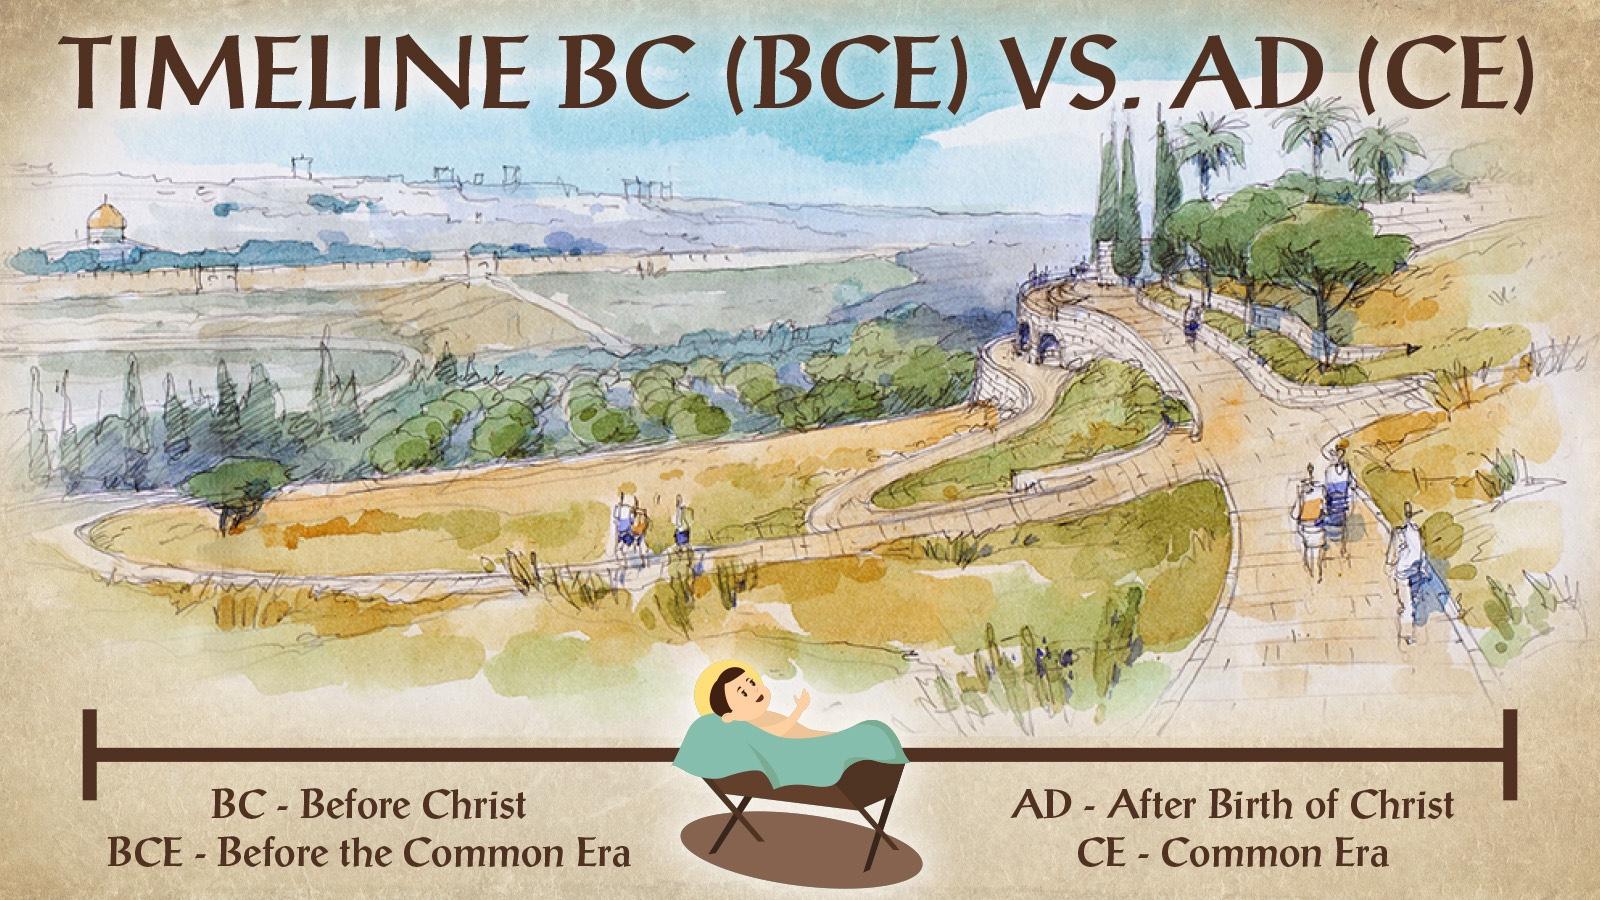 timeline BC (BCE) versus AD (CE)